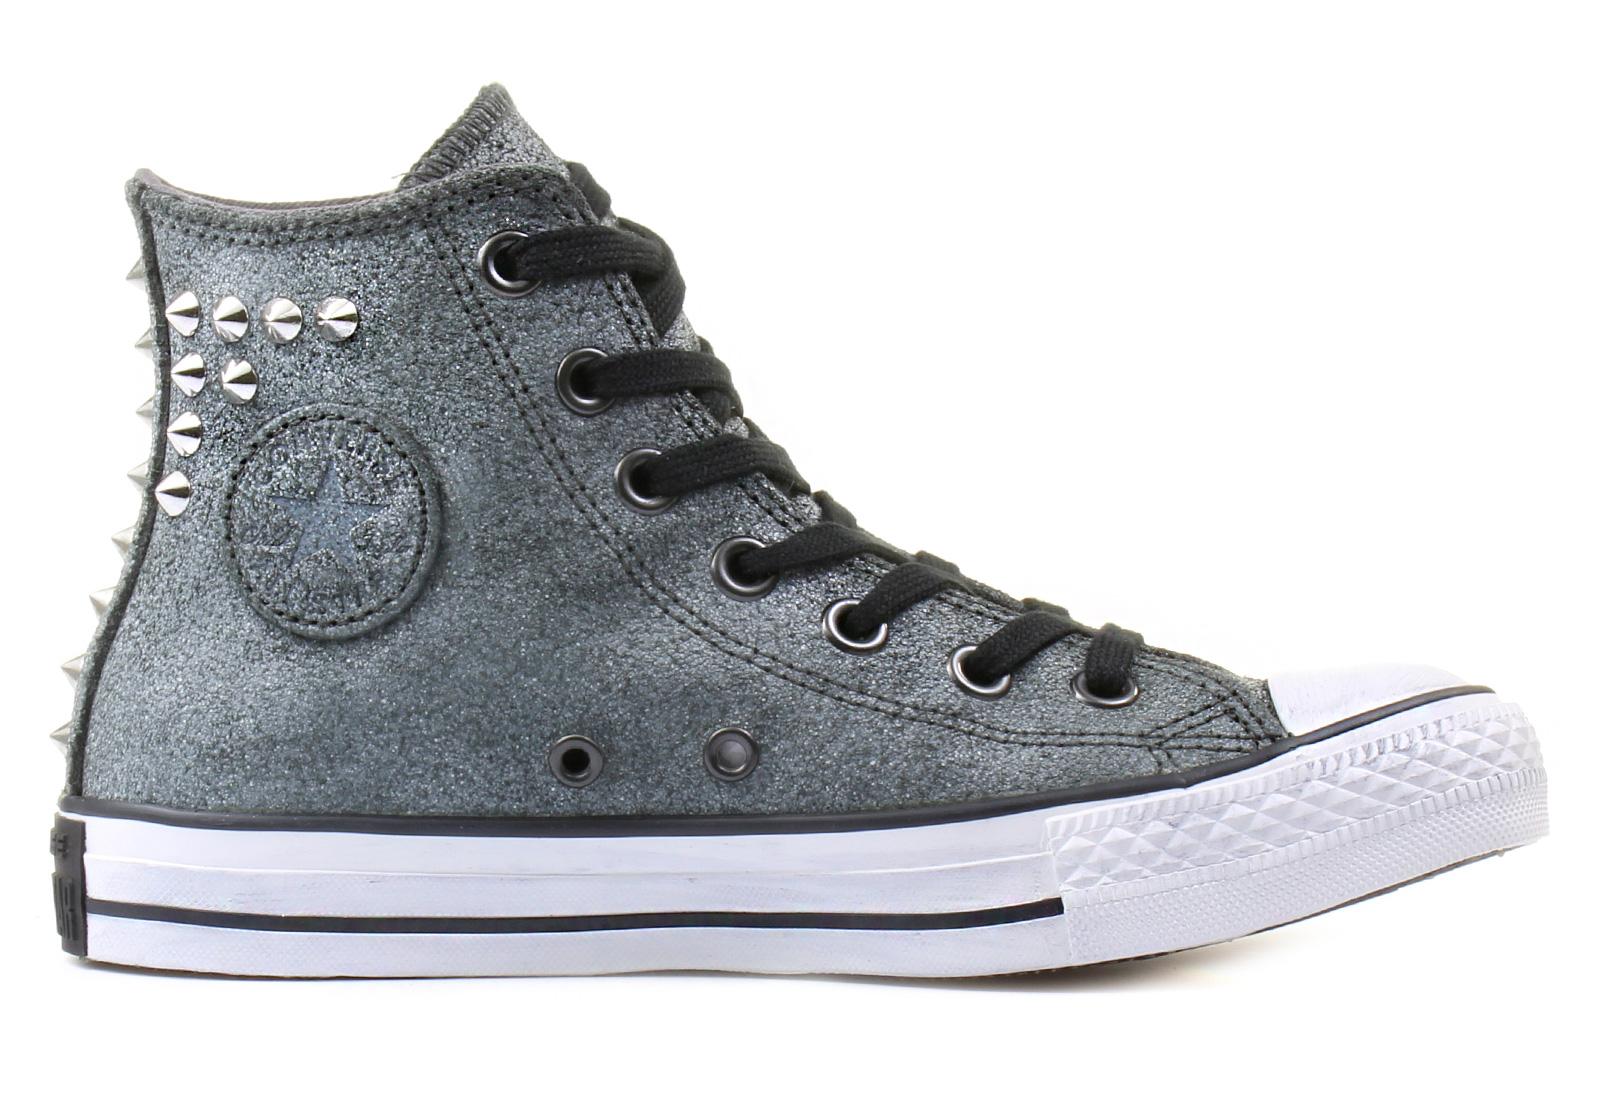 Converse Chuck Taylor All Star tornacipő, szürke (EUR 39,5